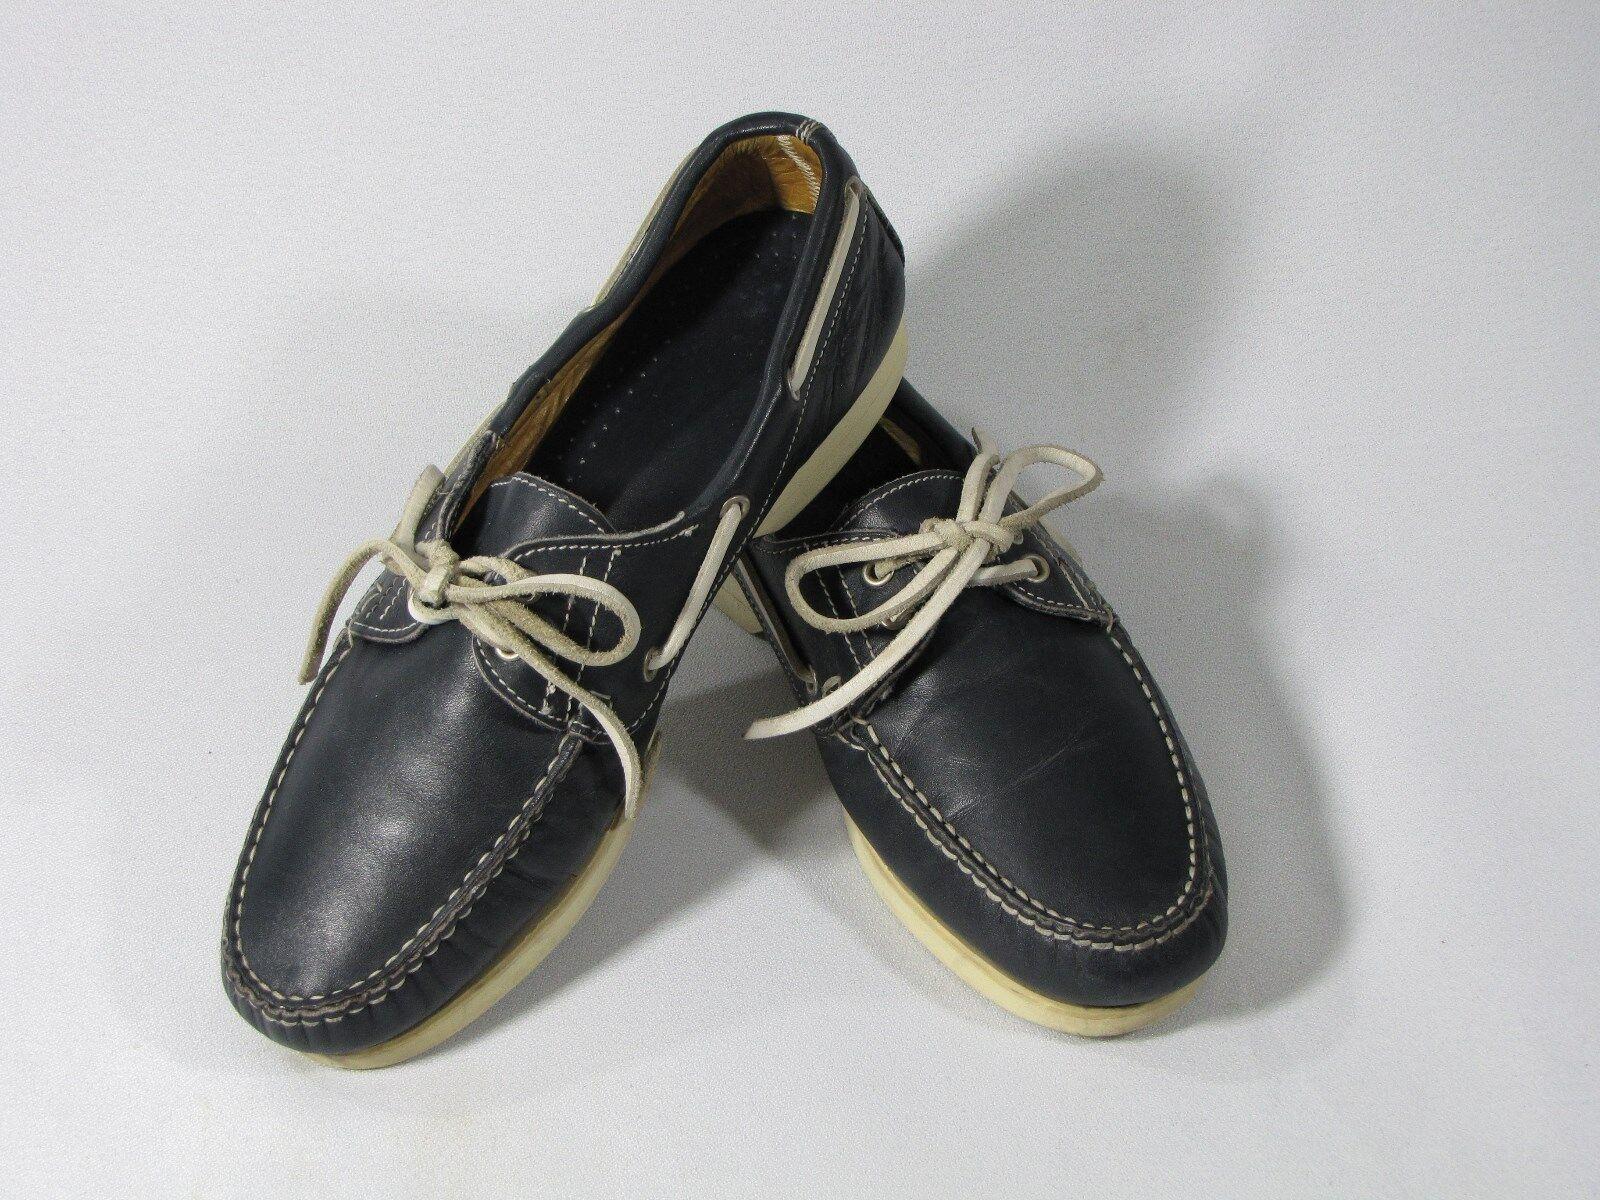 Vintage Allen Solly Boat shoes made in  - men's size 10 med, in Dark bluee